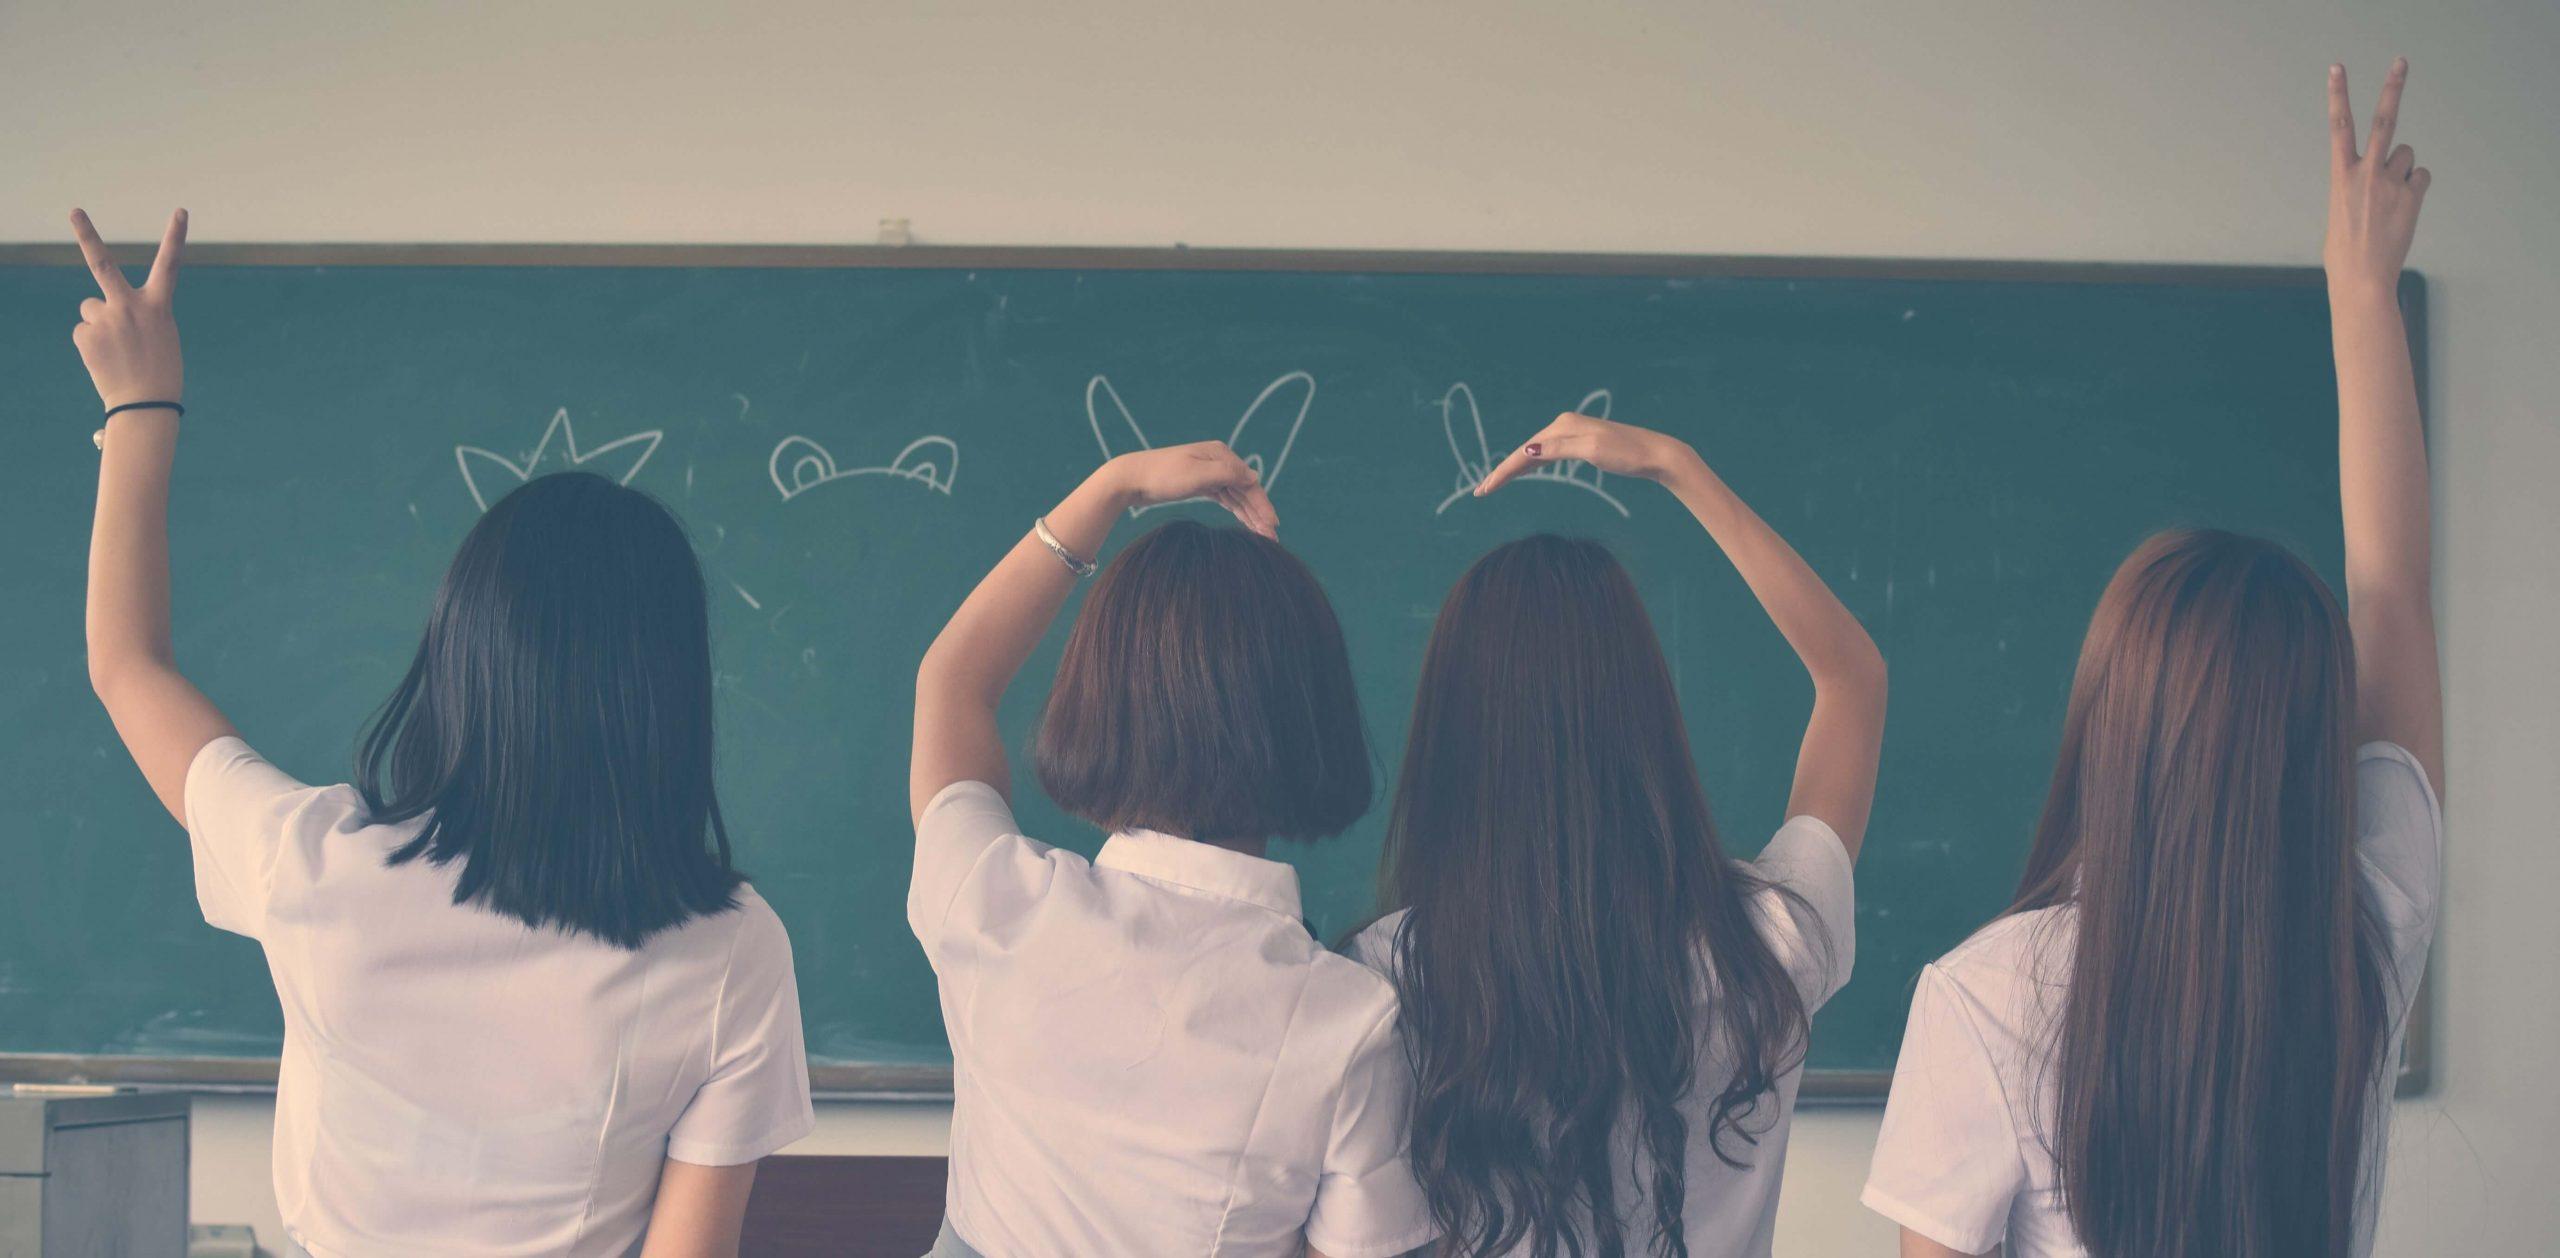 photo-of-four-girls-wearing-school-uniform-doing-hand-signs-710743 (1)